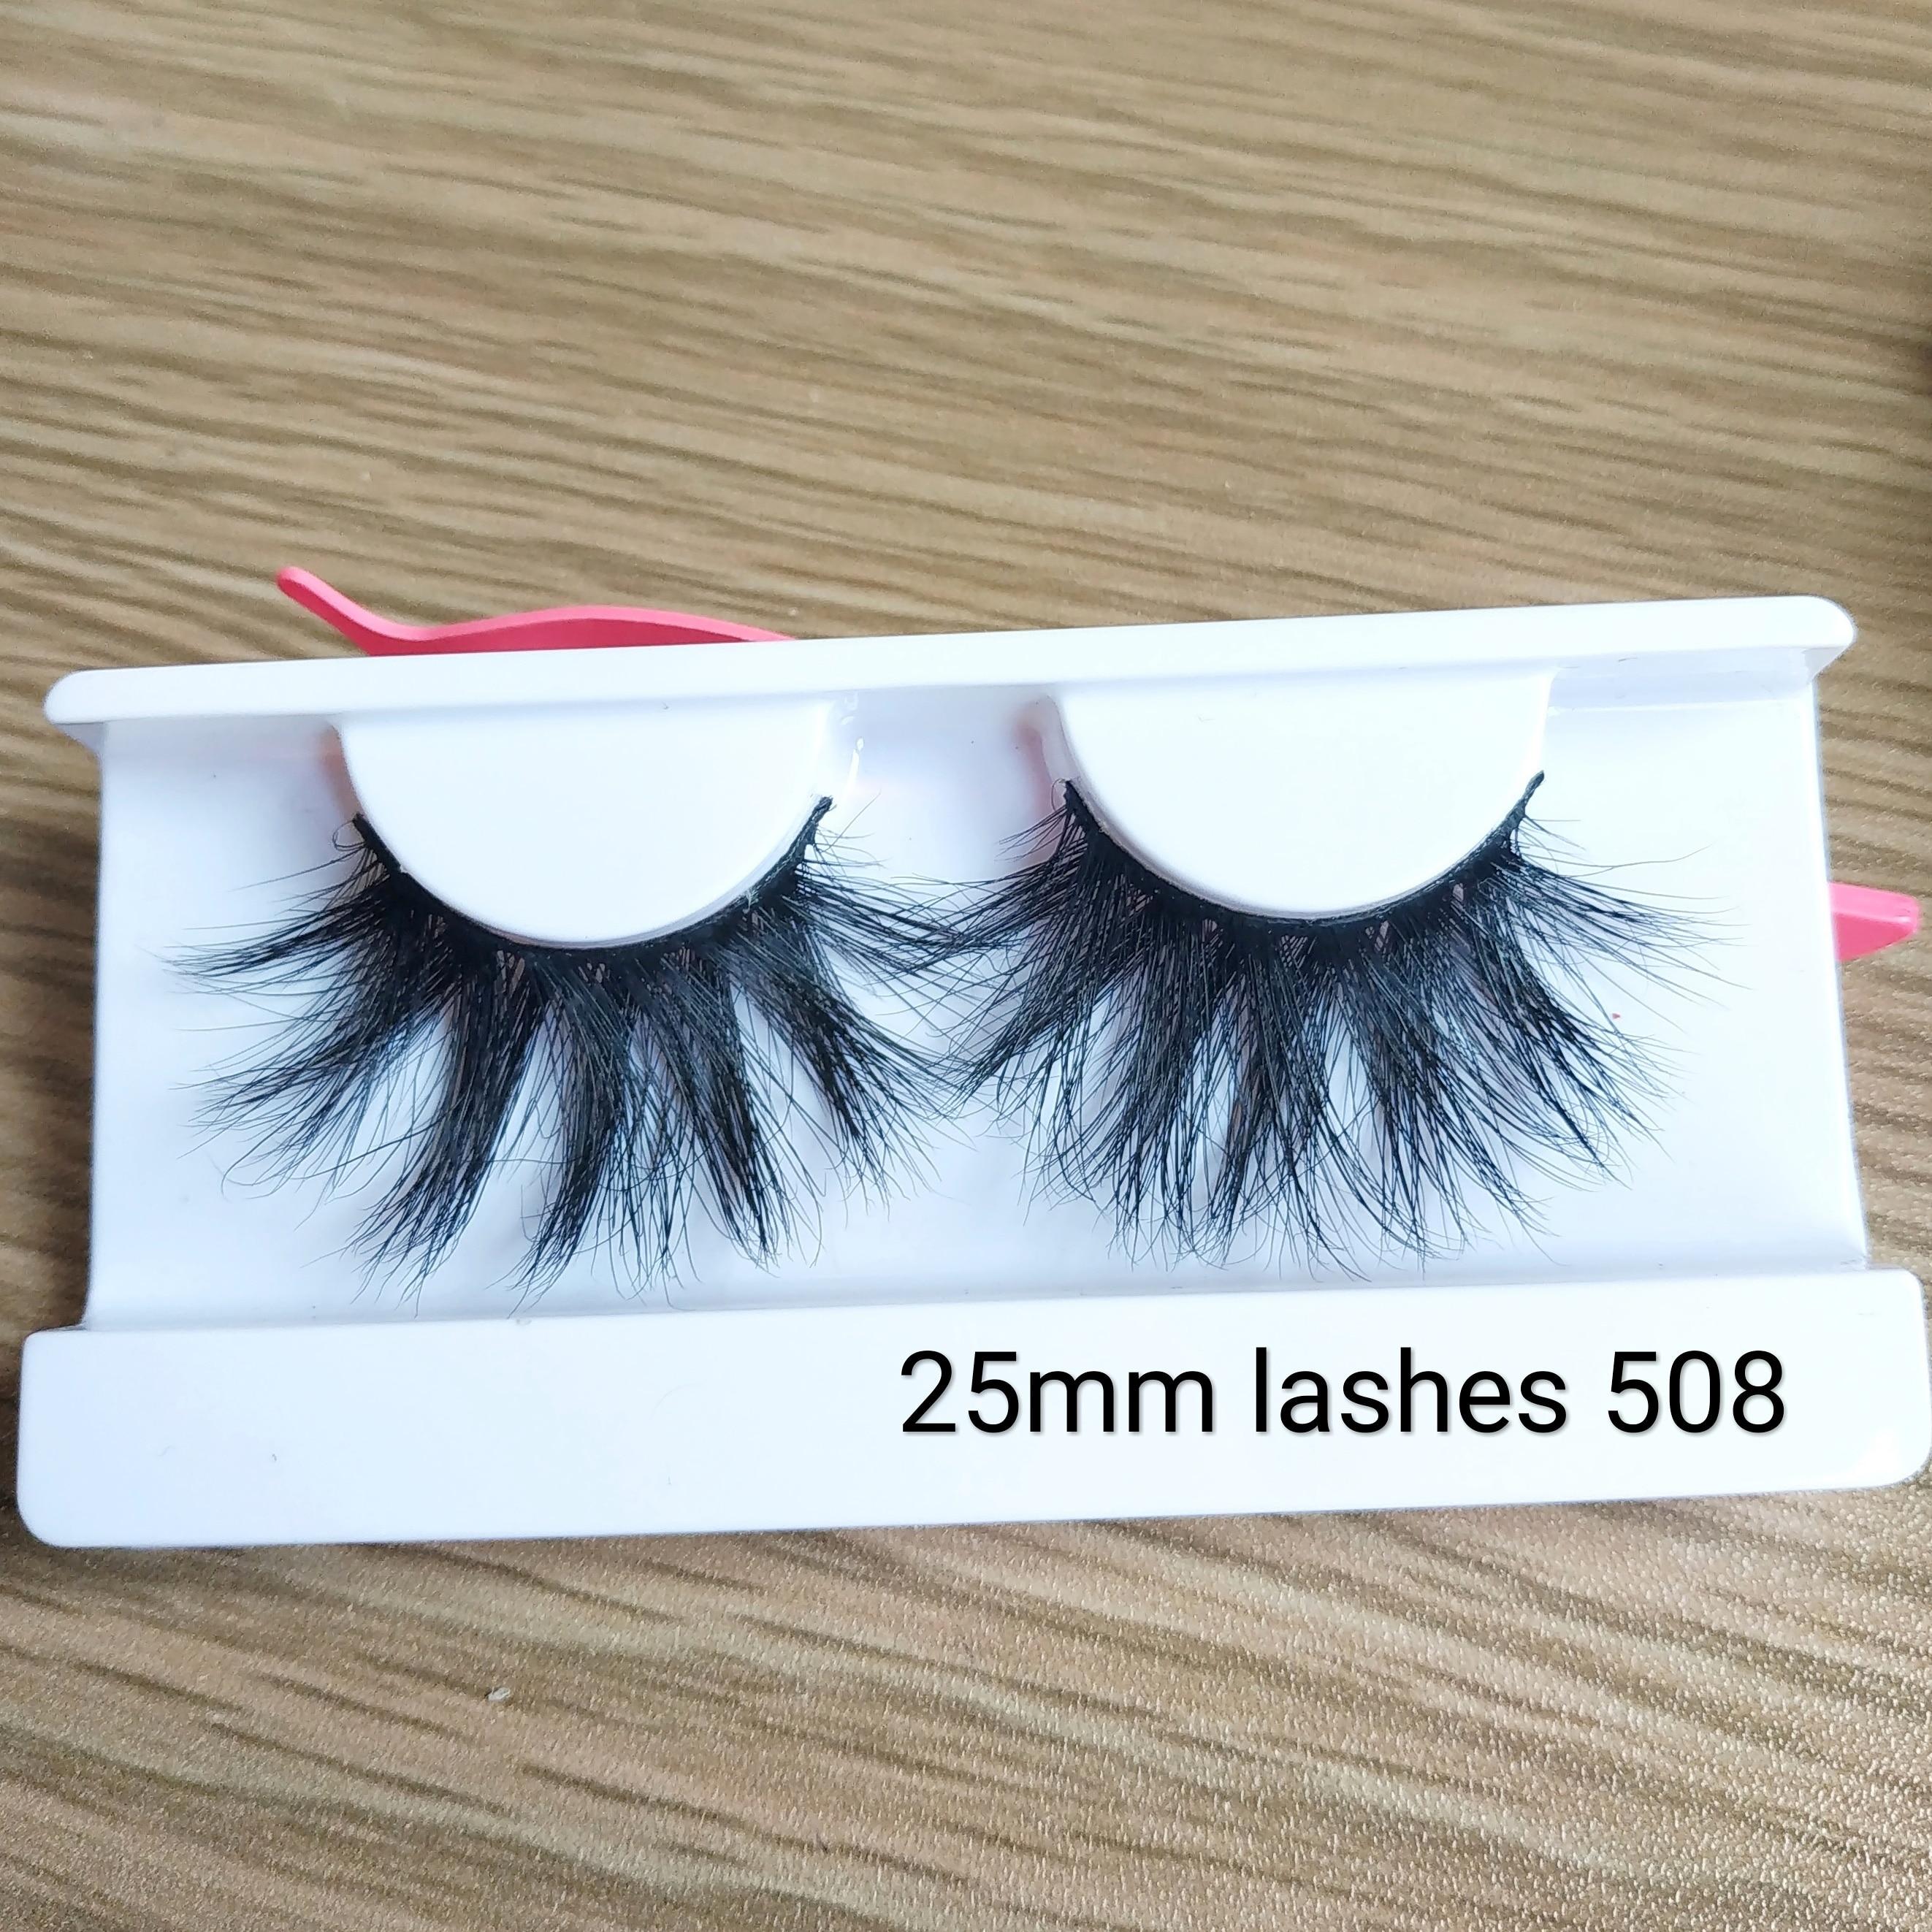 25mm Minklashes  False Eyelashes Fake Lashes Long 5D Mink Cruelty Free Eyelash Handmade Reusable Extension Mink Beauty Makeup